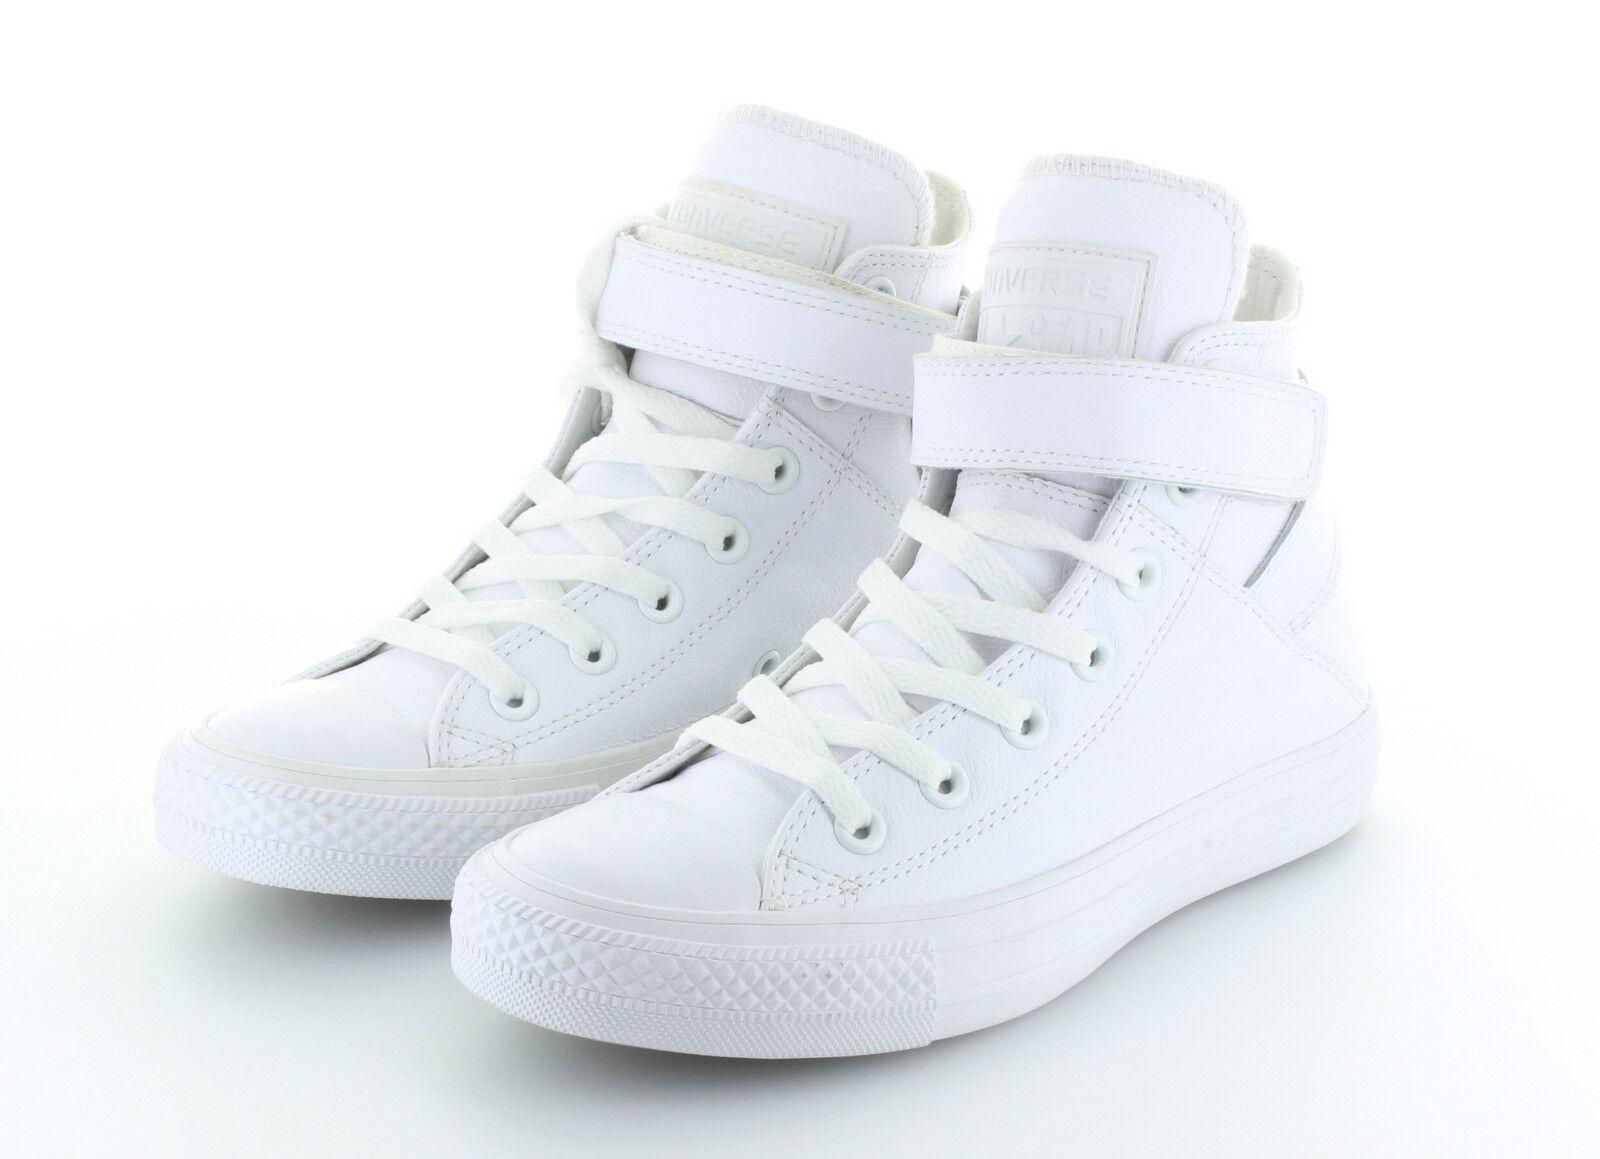 Converse CT AS Limited Edition Hi Brea Mono Leather Weiß Weiß Weiß Gr. 37,5   38,5 4e1972